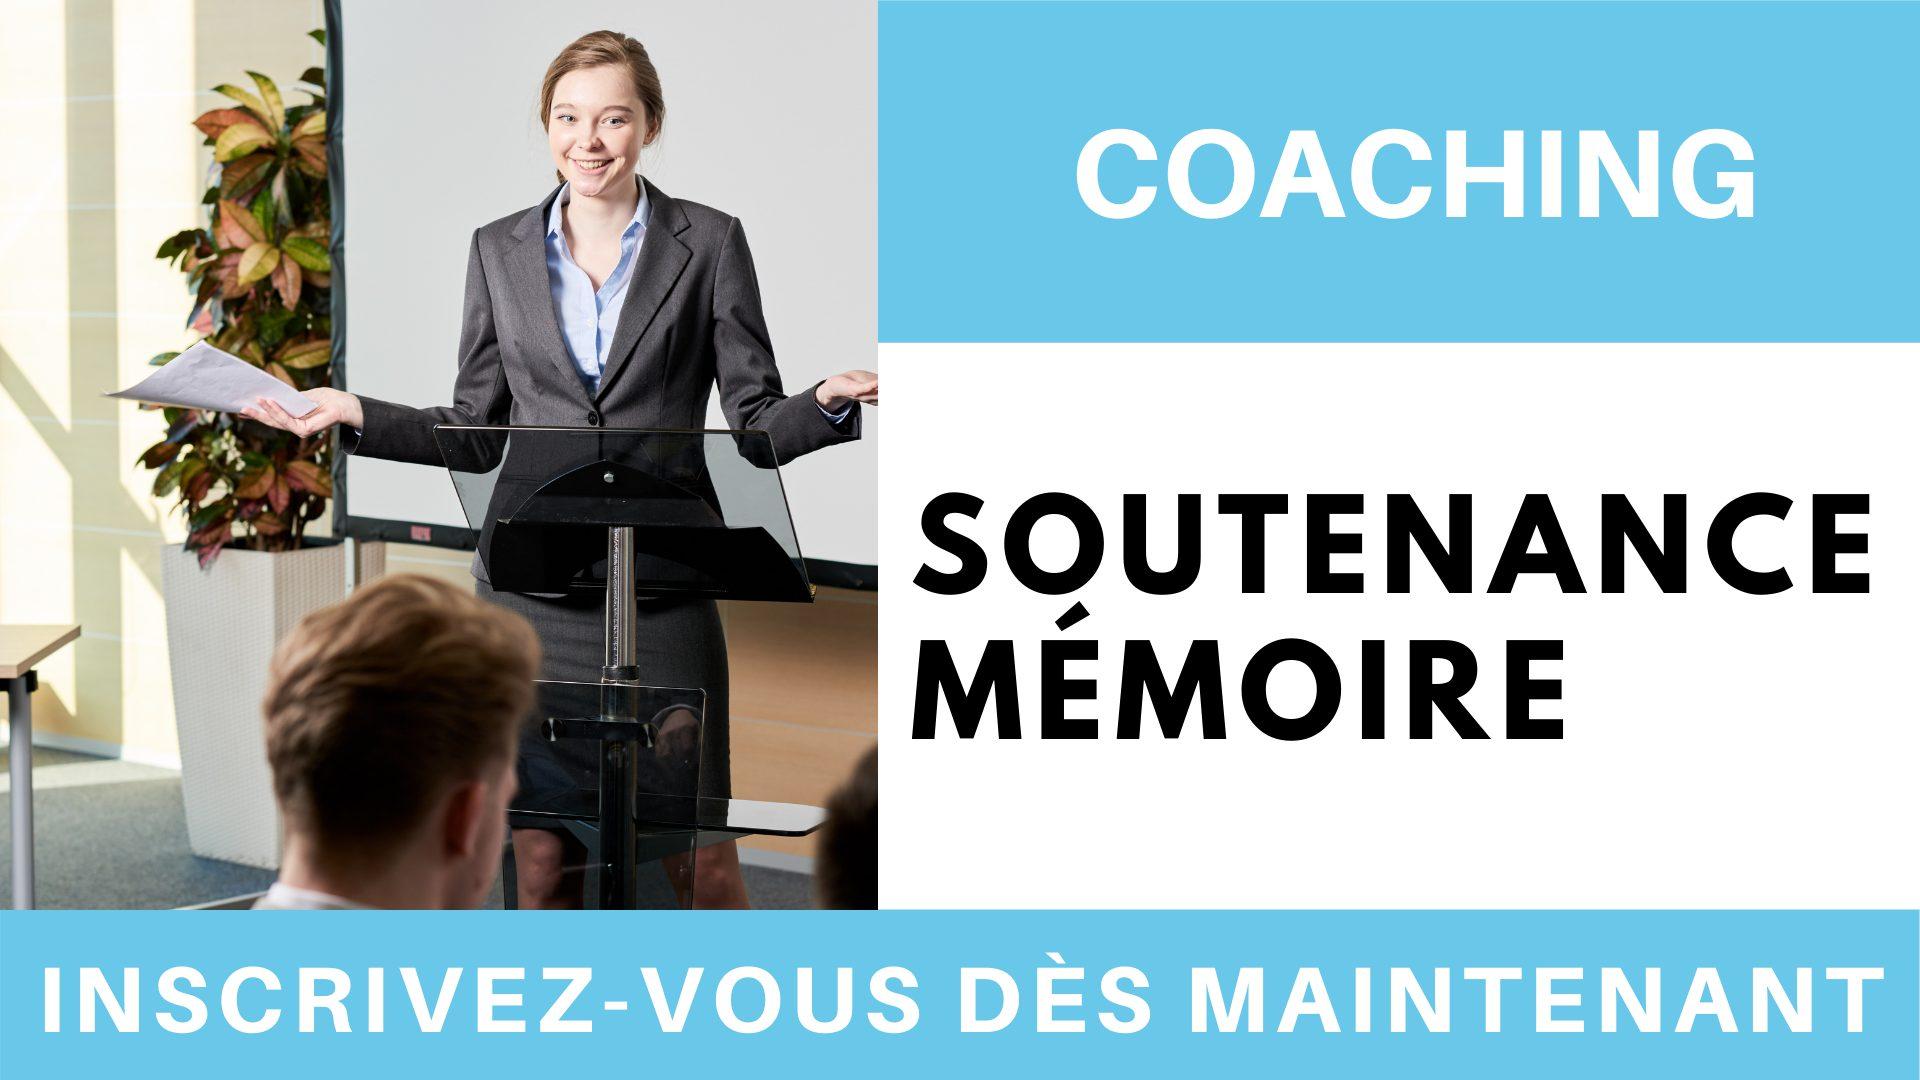 Coaching soutenance mémoire